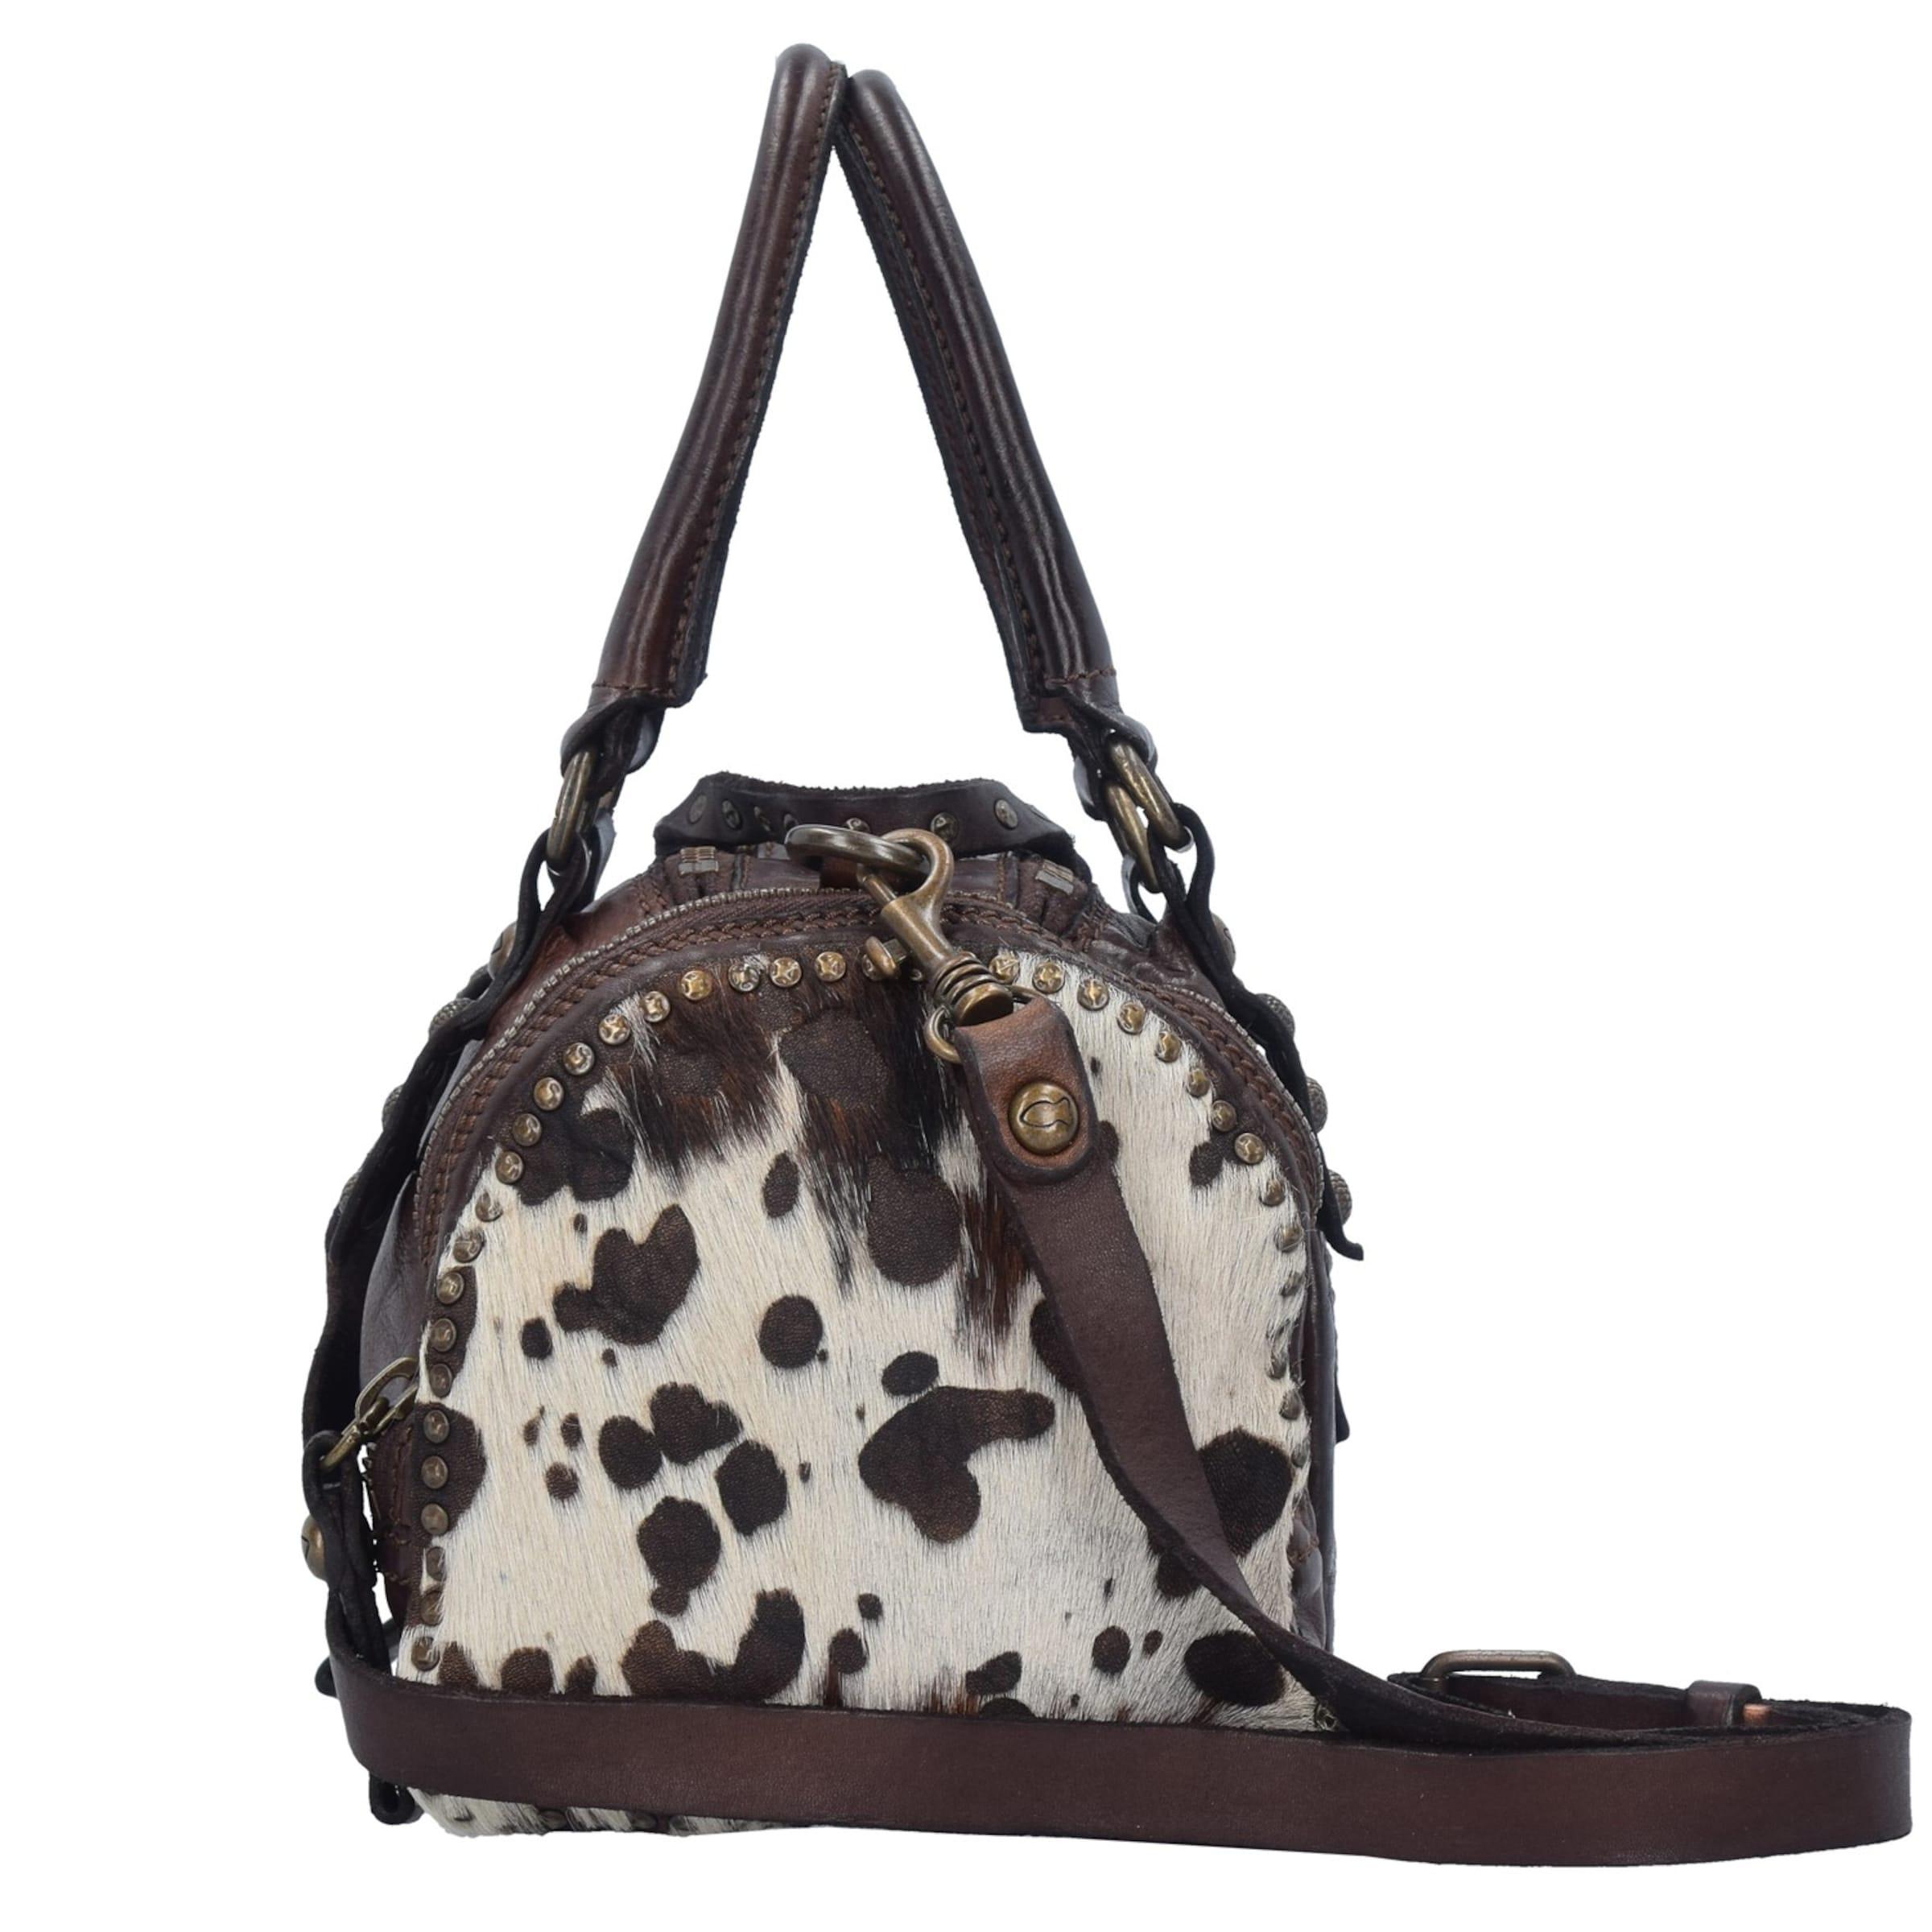 Bag Campomaggi Mini Leder 20 Bauletto Campomaggi cm Handtasche Bauletto wI5qOH